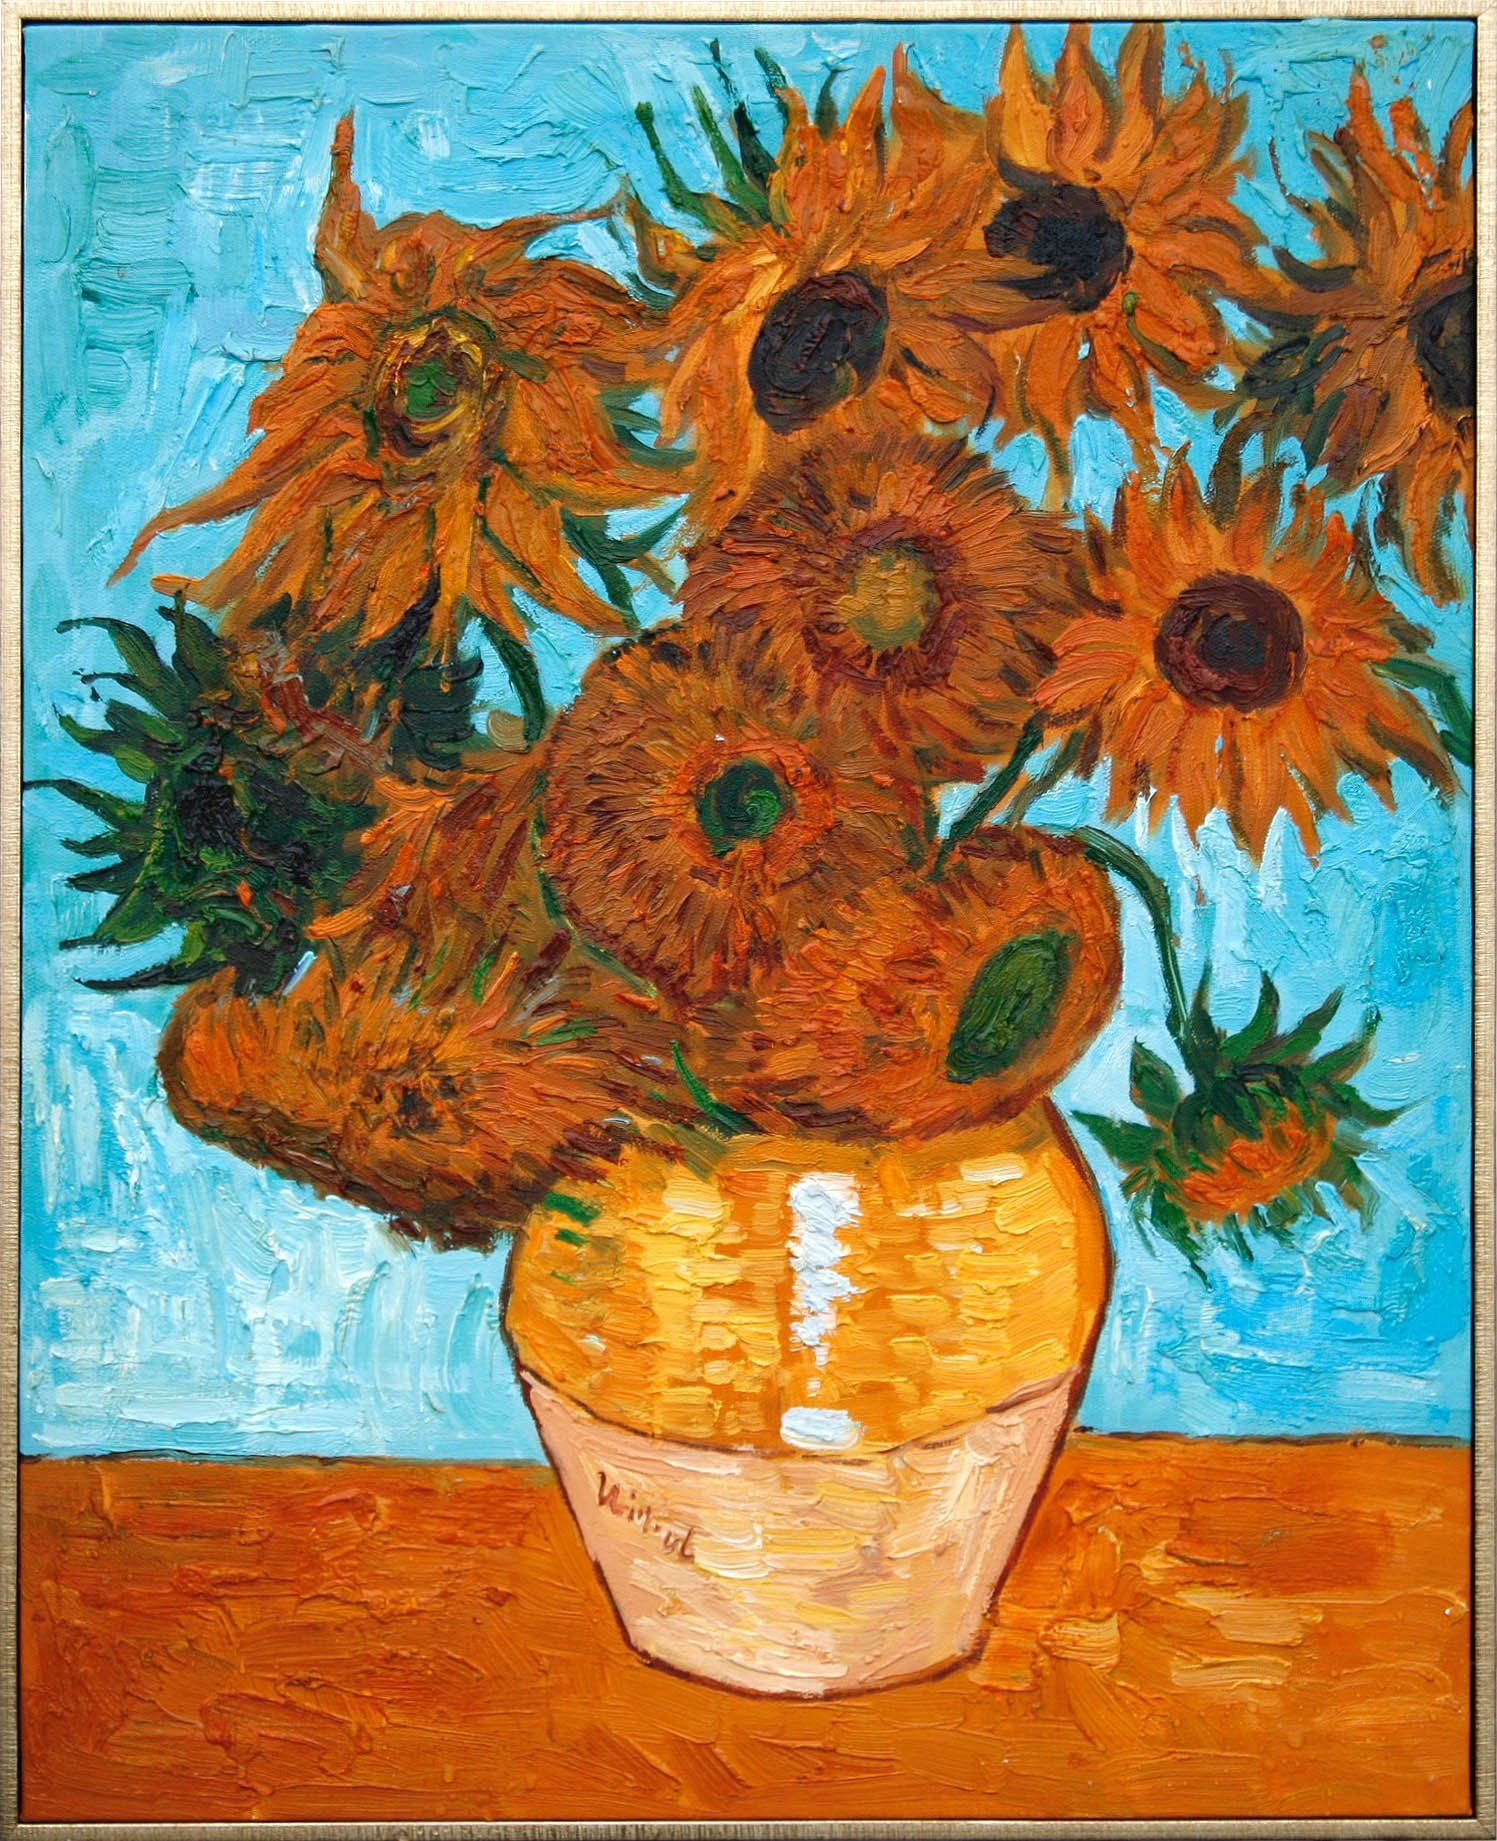 1888 Impressionist Print Poster 24x32 Vincent van Gogh Sunflowers on Blue